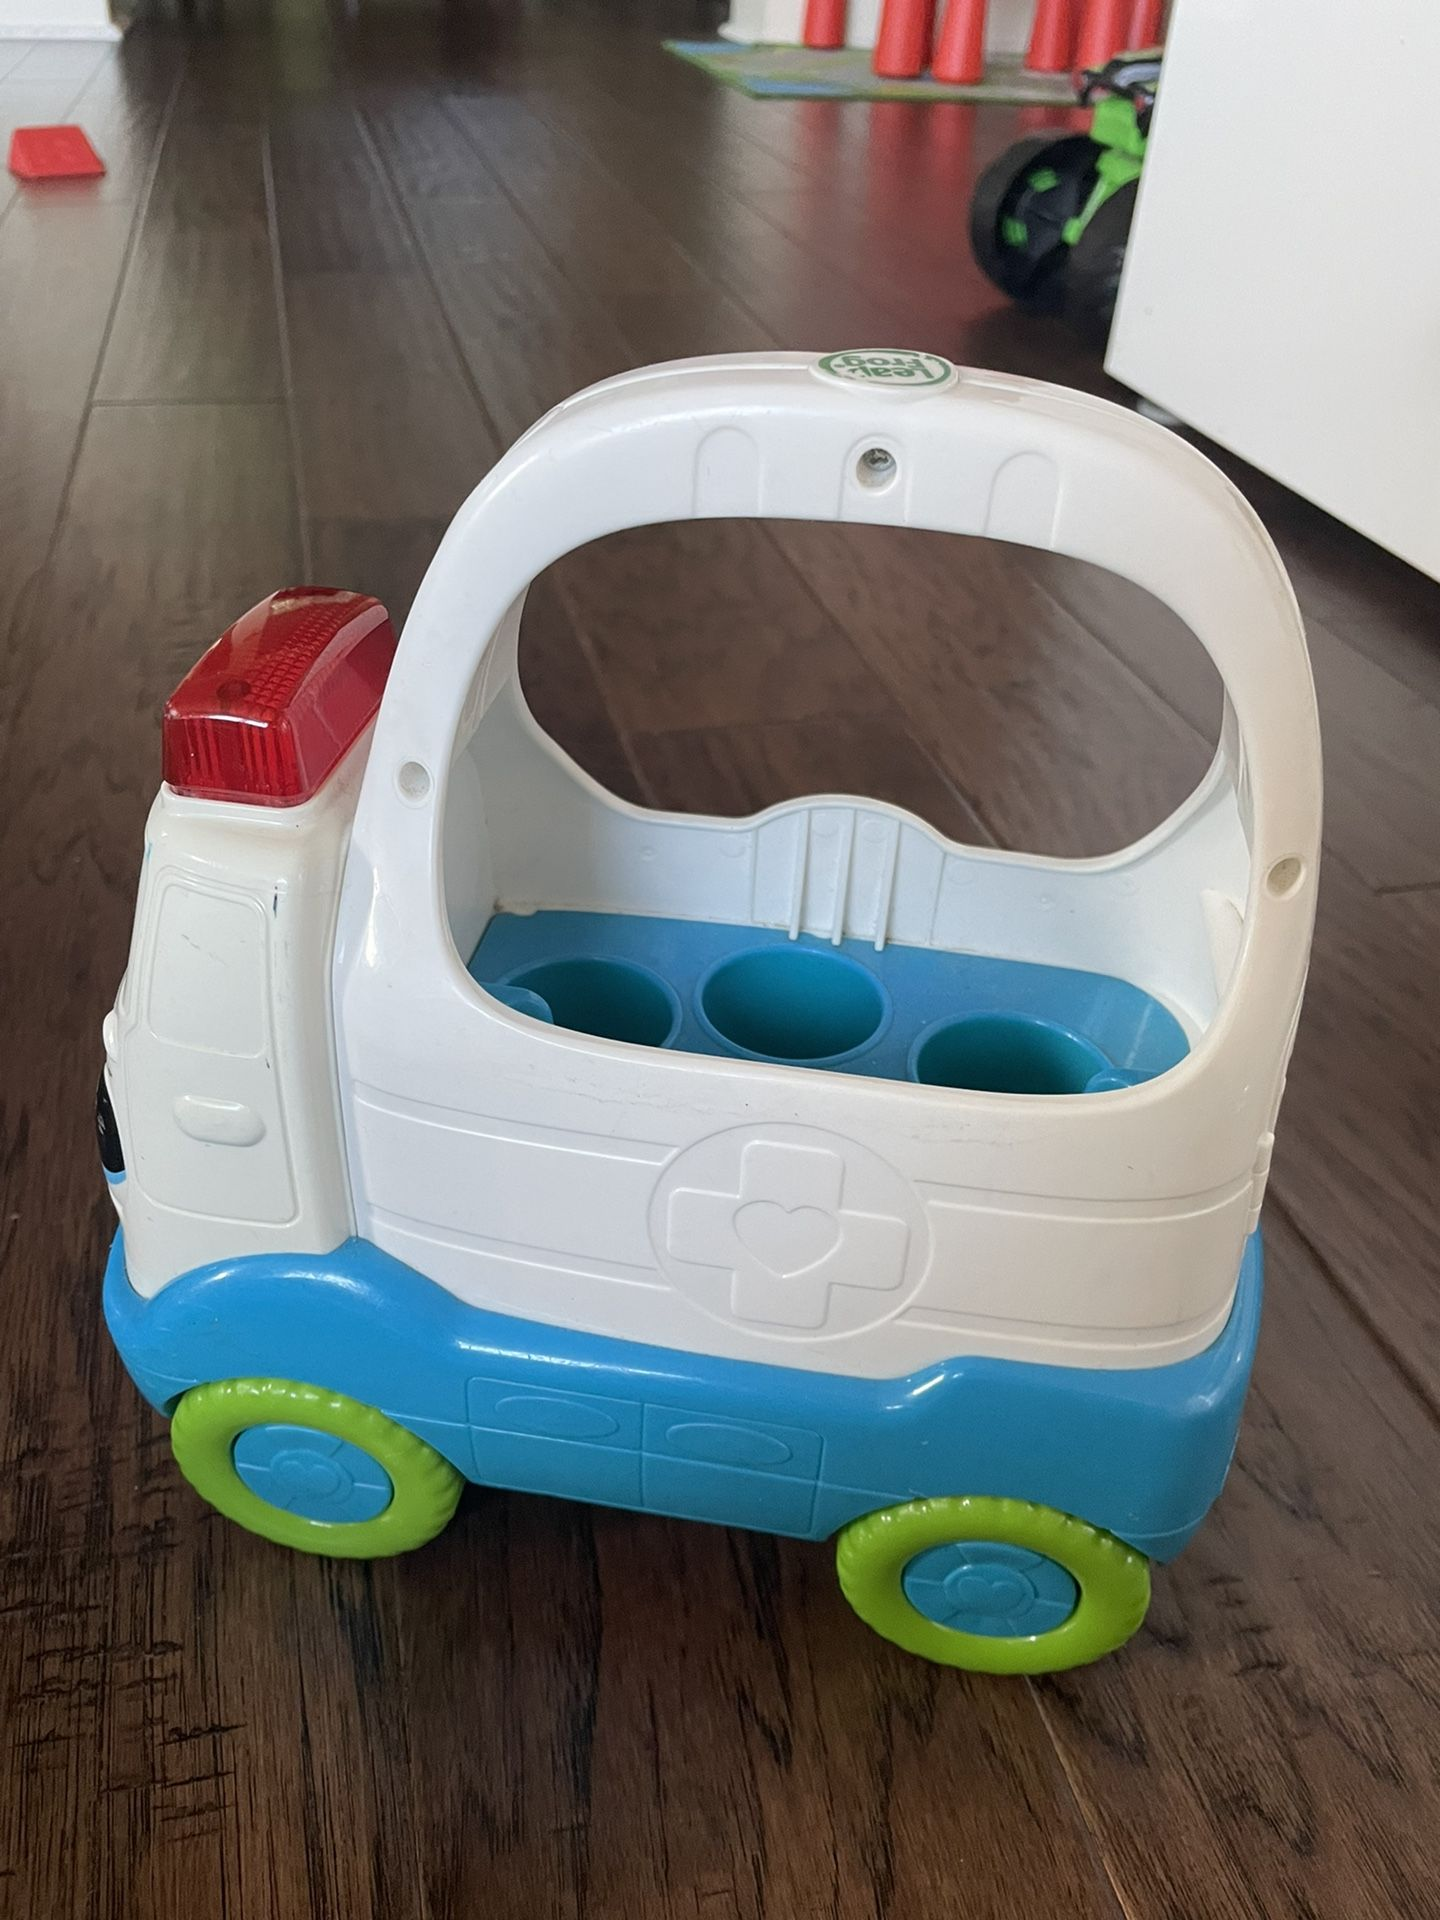 Toy Car Team- Very Nice Set